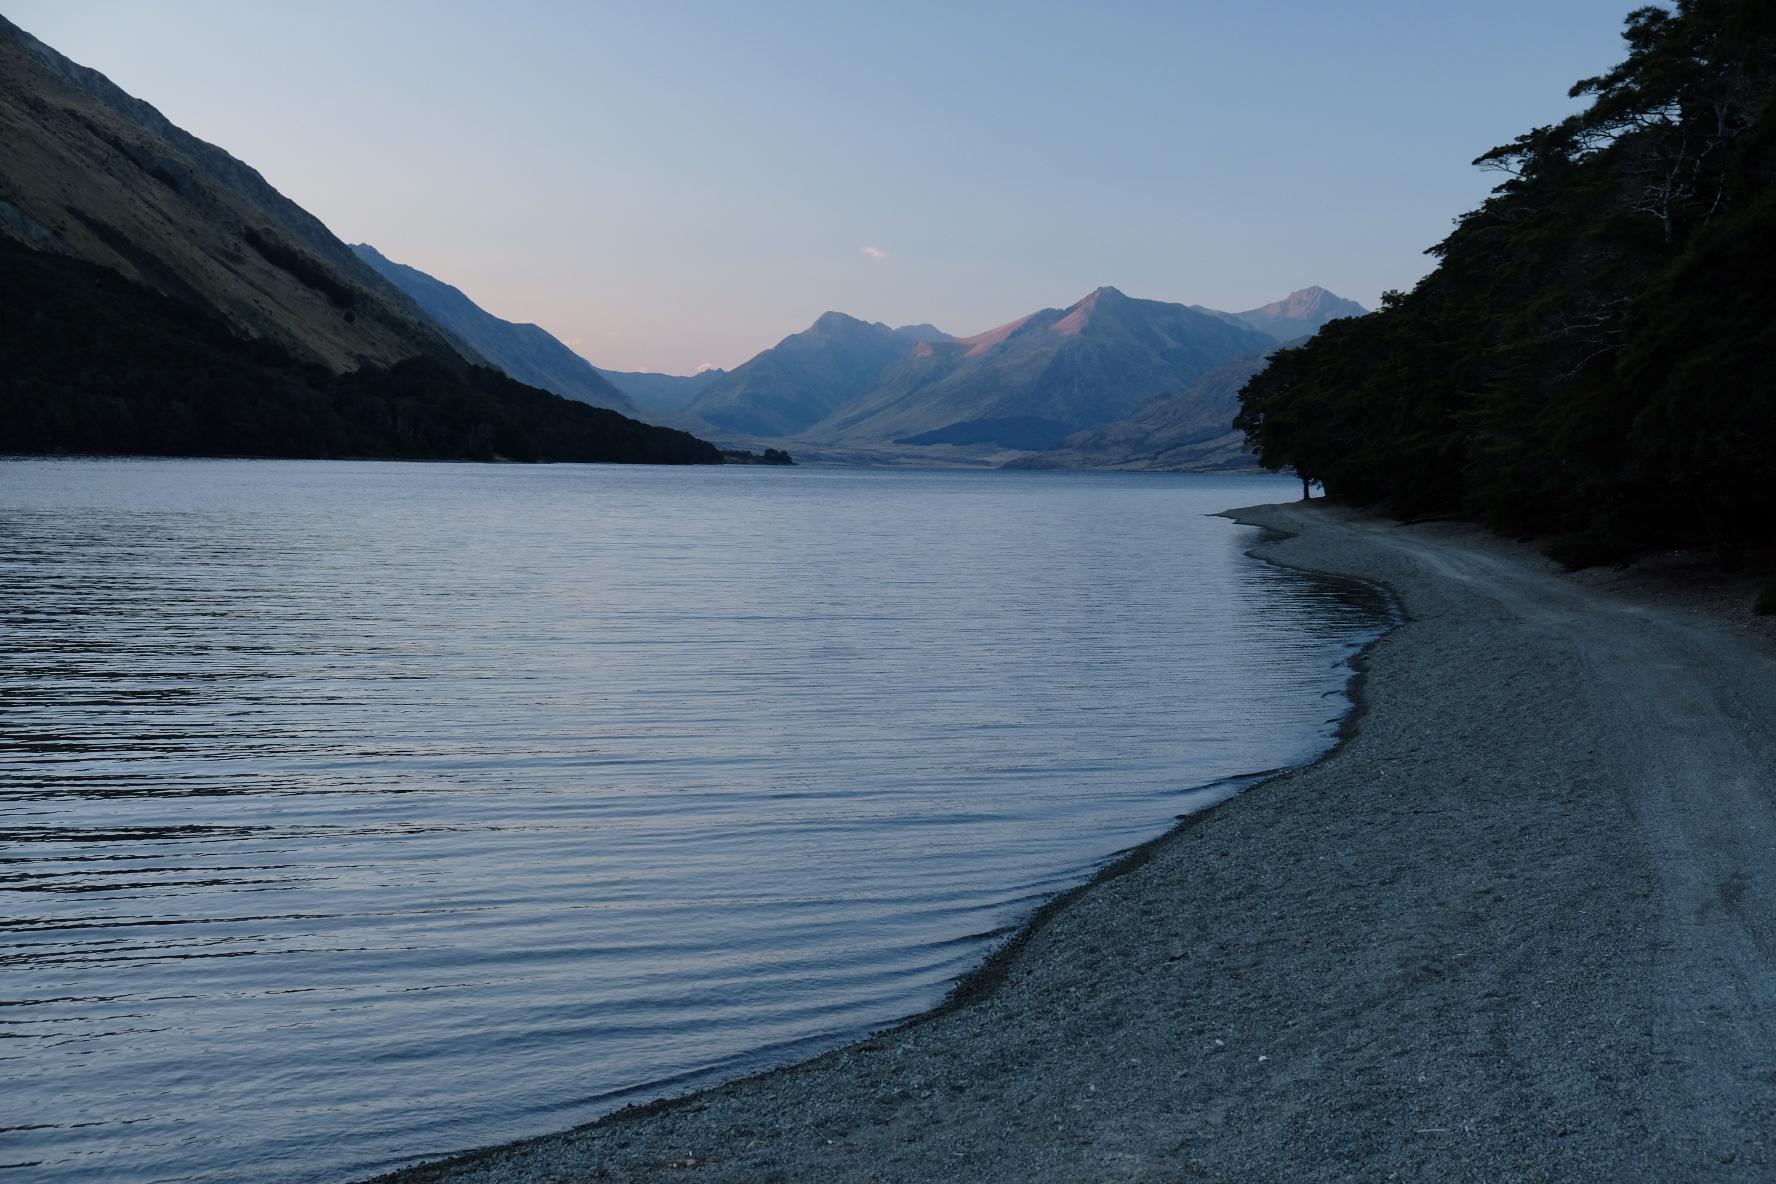 Tolkien shores